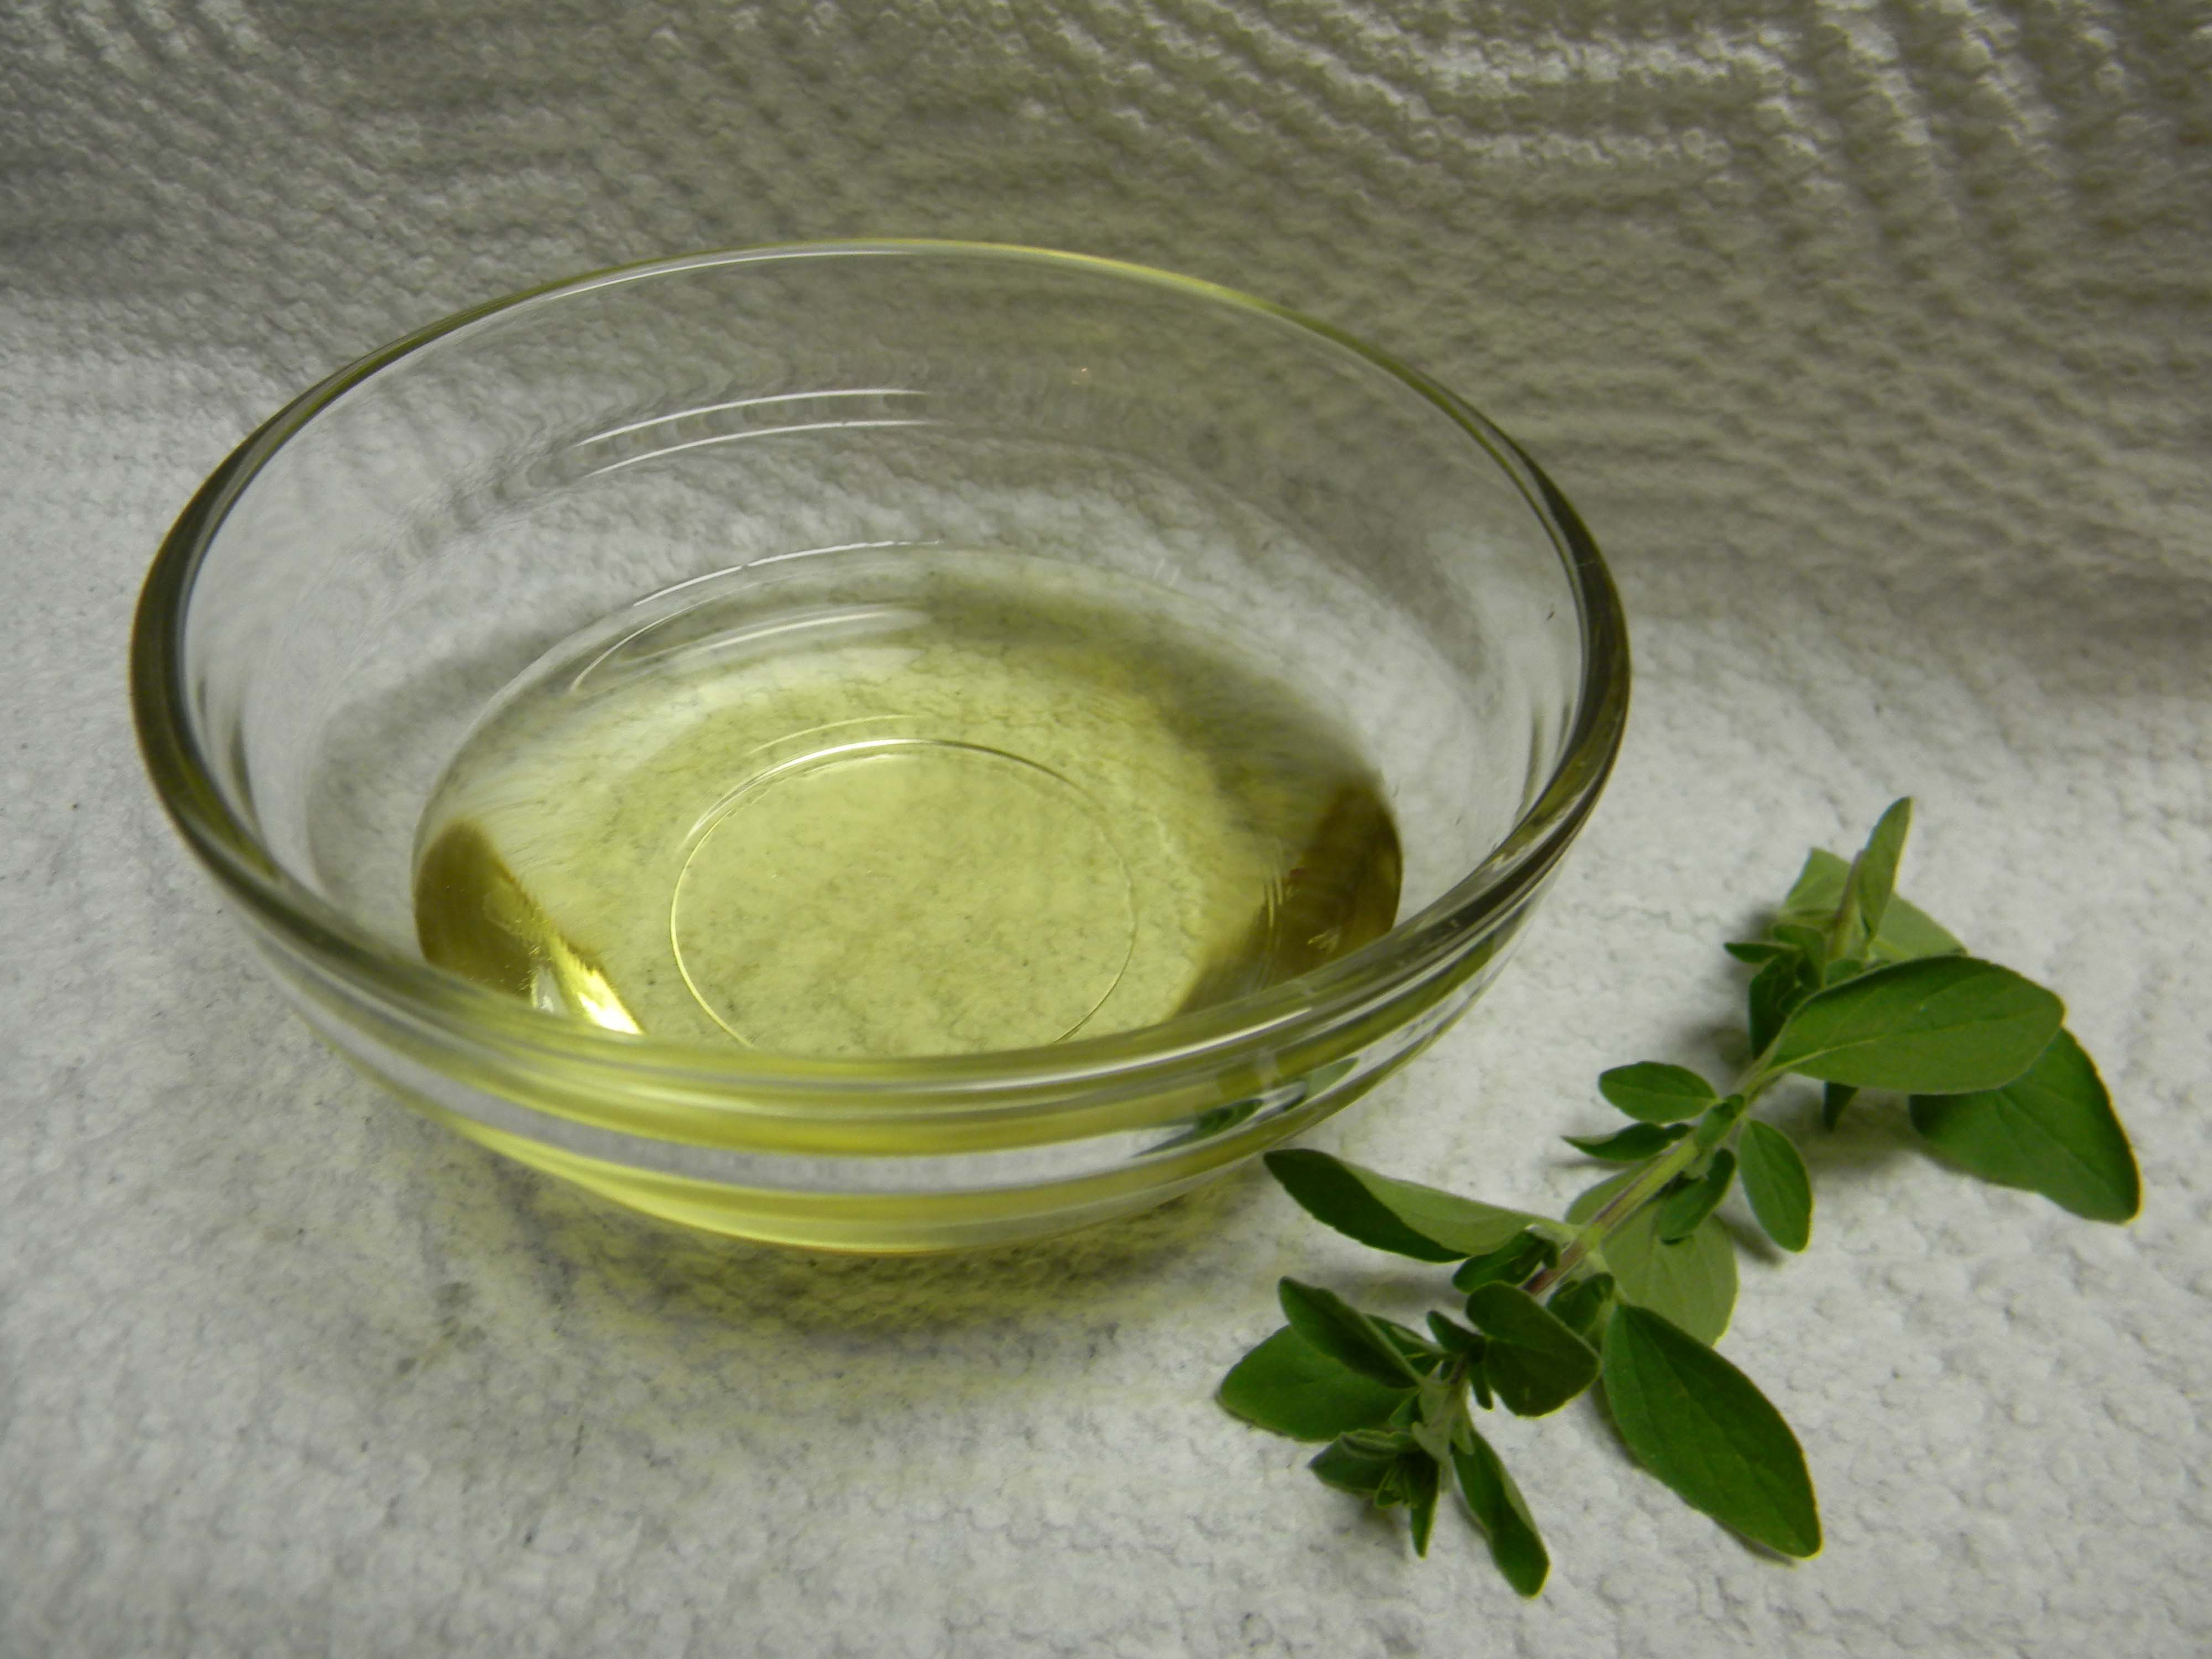 Arnica Oil Benefits